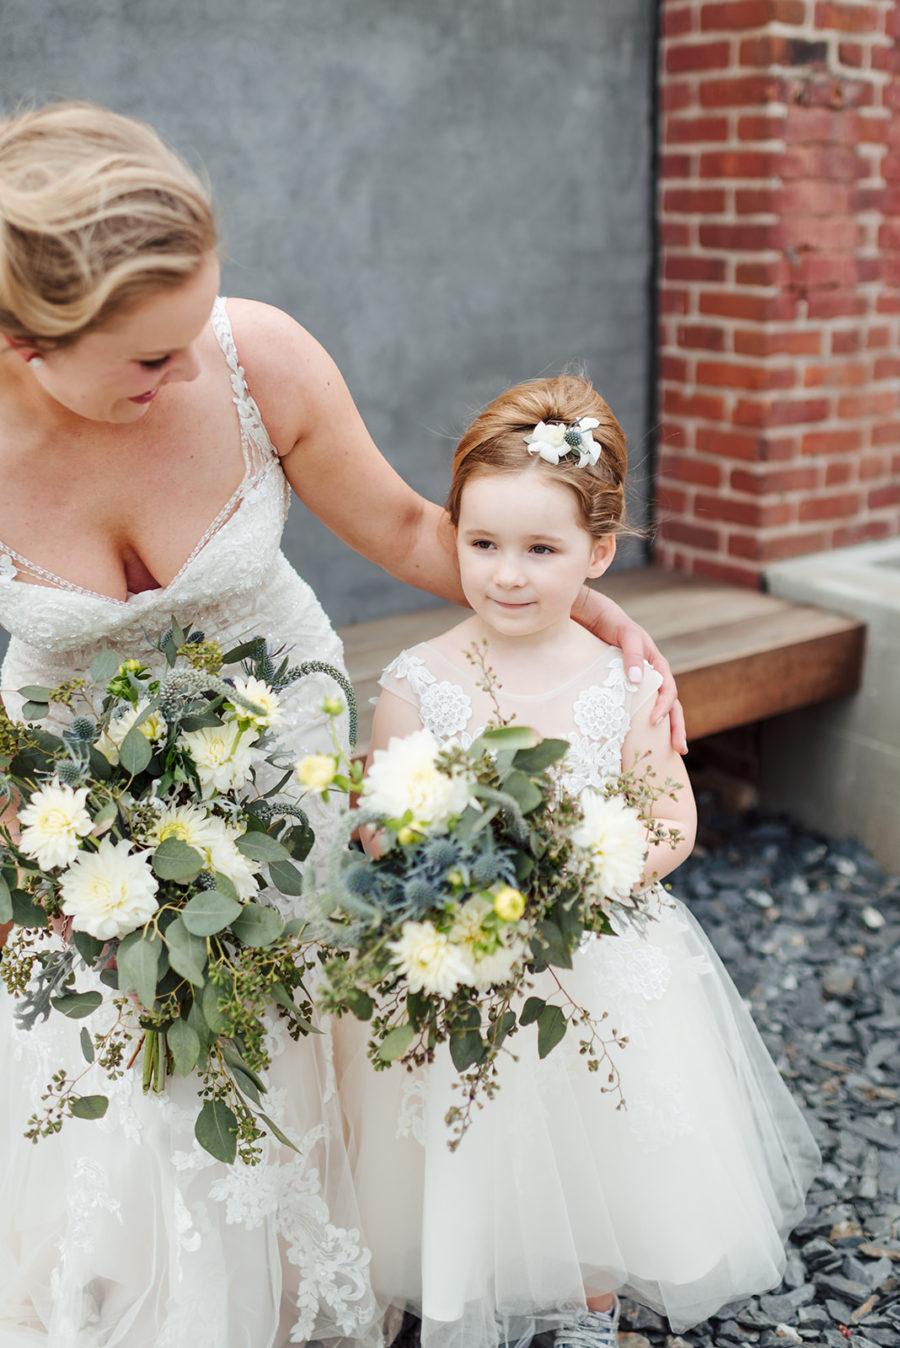 Flower girl and bride wedding photography: Nashville wedding at Clementine featured on Nashville Bride Guide